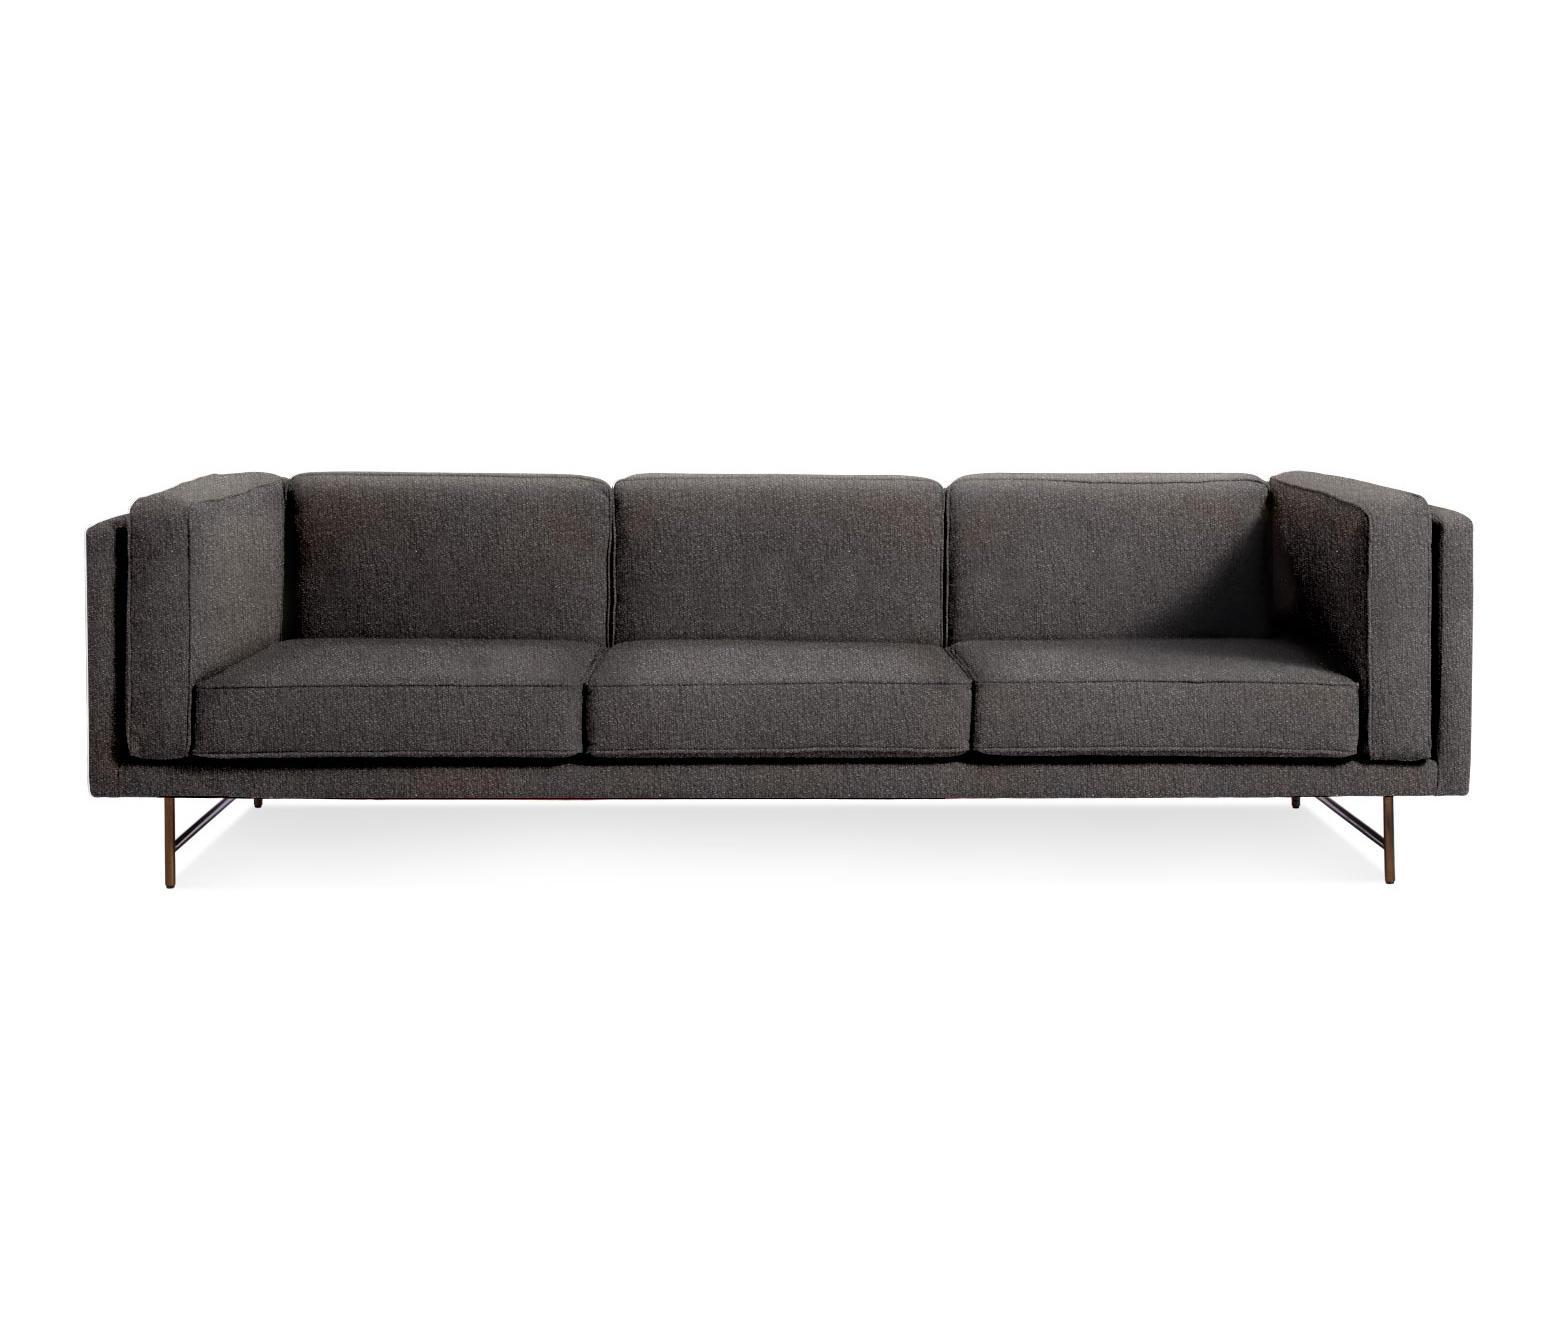 blu dot sofa crushed velvet set bank 96 lounge sofas from architonic